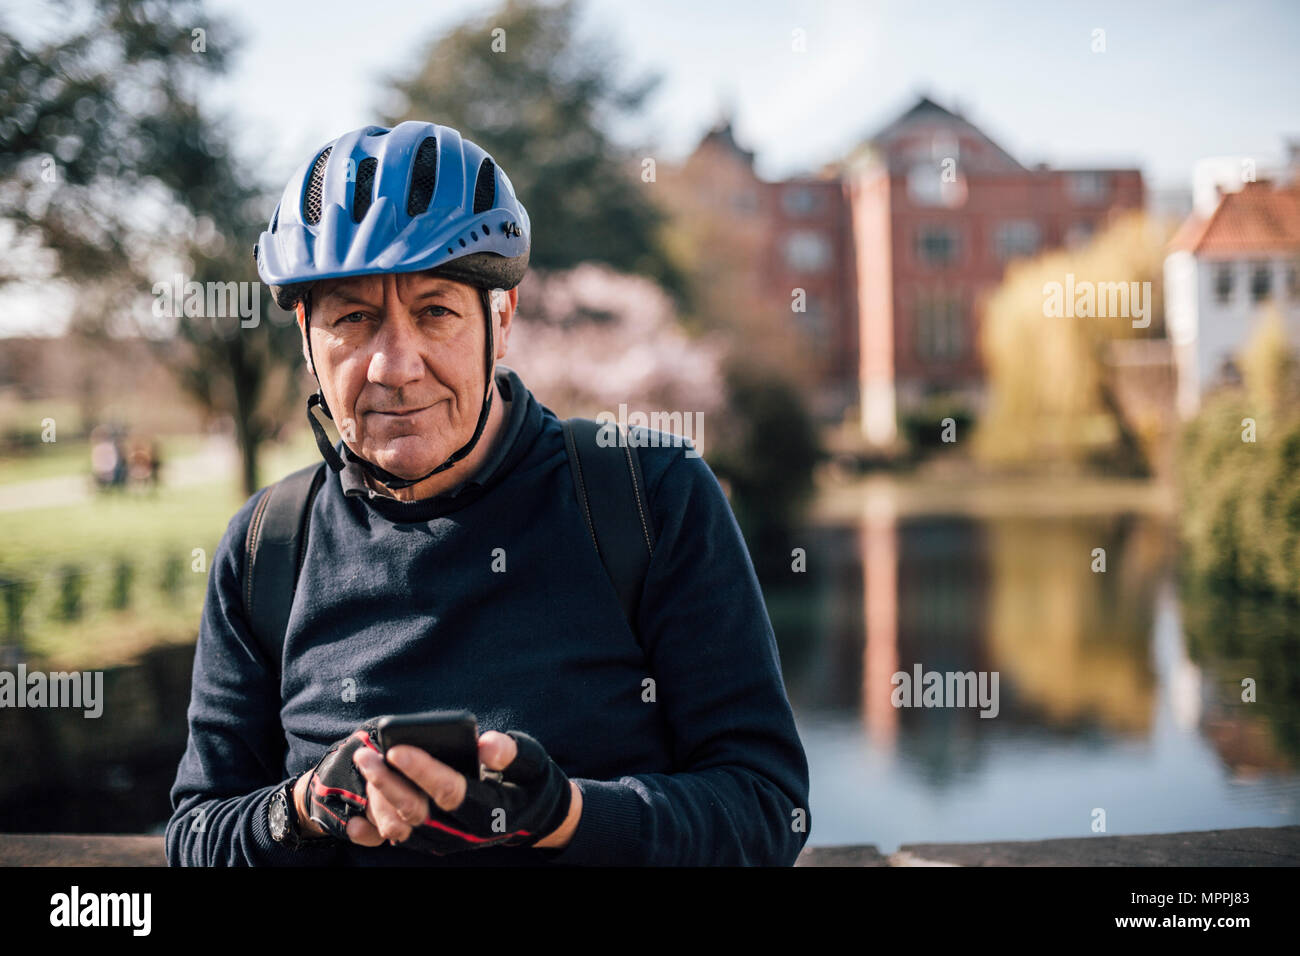 Portrait of senior man with casque de vélo using smartphone Photo Stock